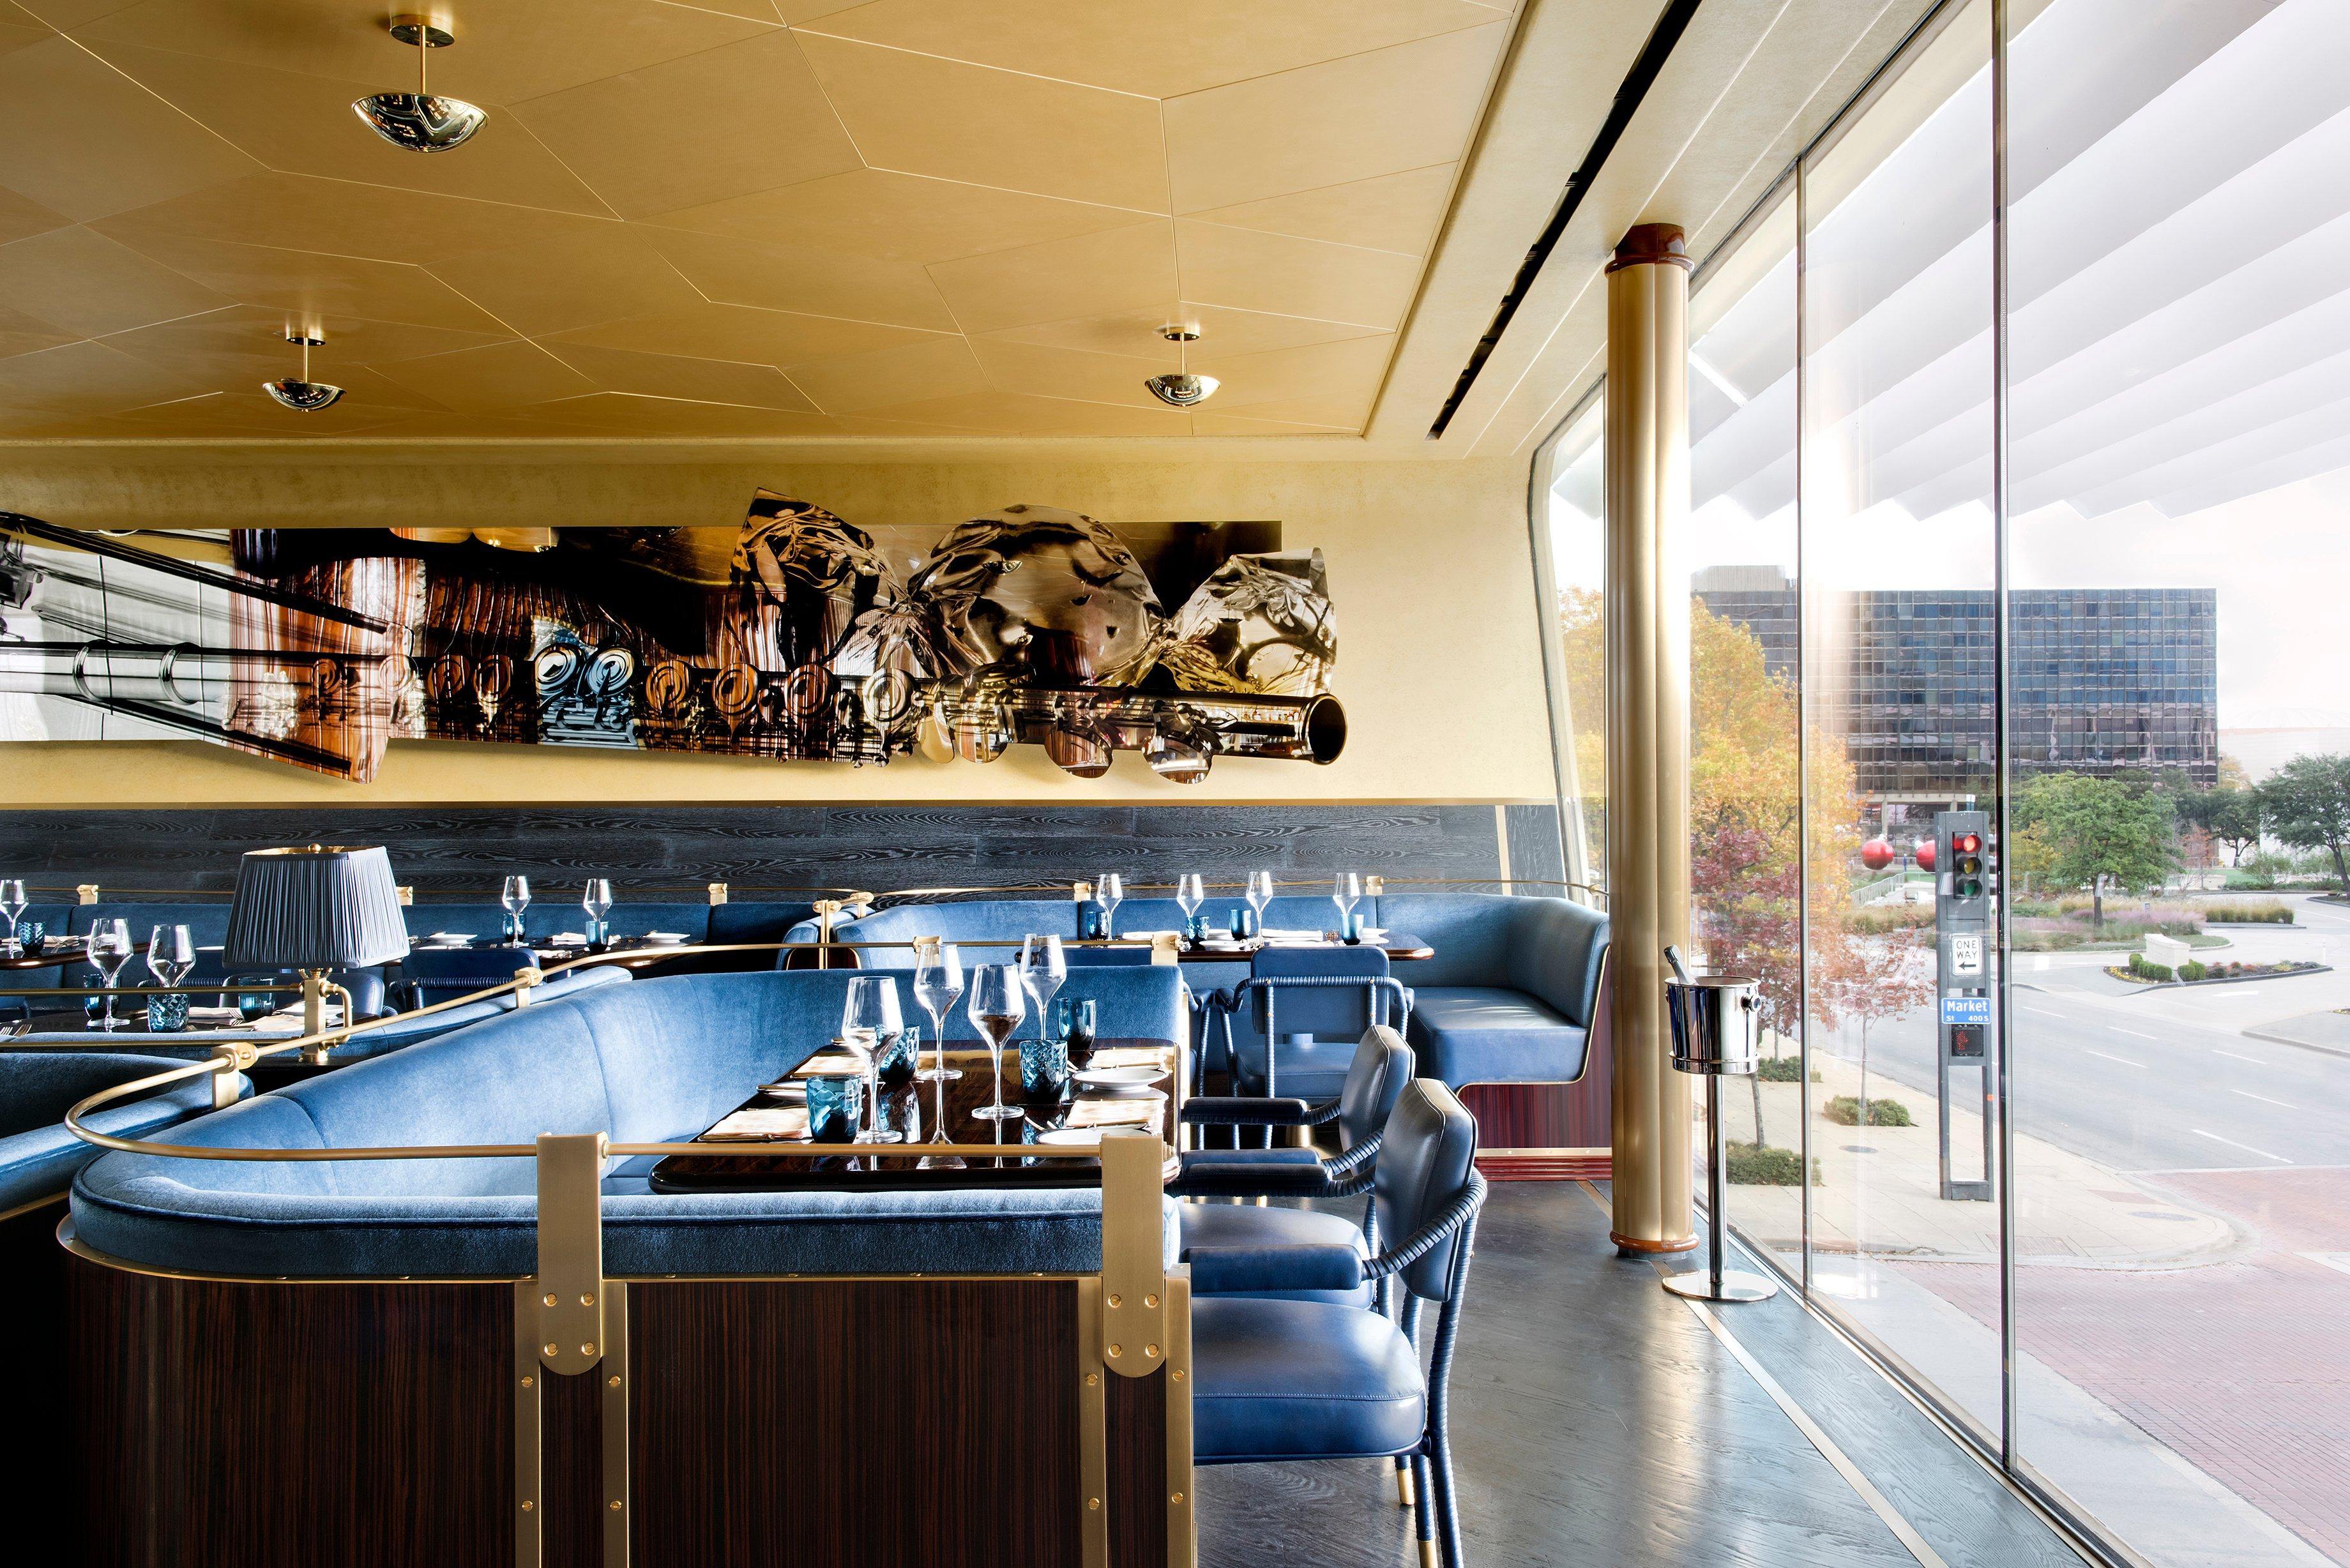 Martin Brudnizki, Martin Brudnizki Design Studio, Top Interior Designers, Interior Designers, Luxury Interior Designers, Top Interior Designers in London, Stockholm Designers, Sexy Fish, James McDonald, Best Designed Restaurants in Dallas